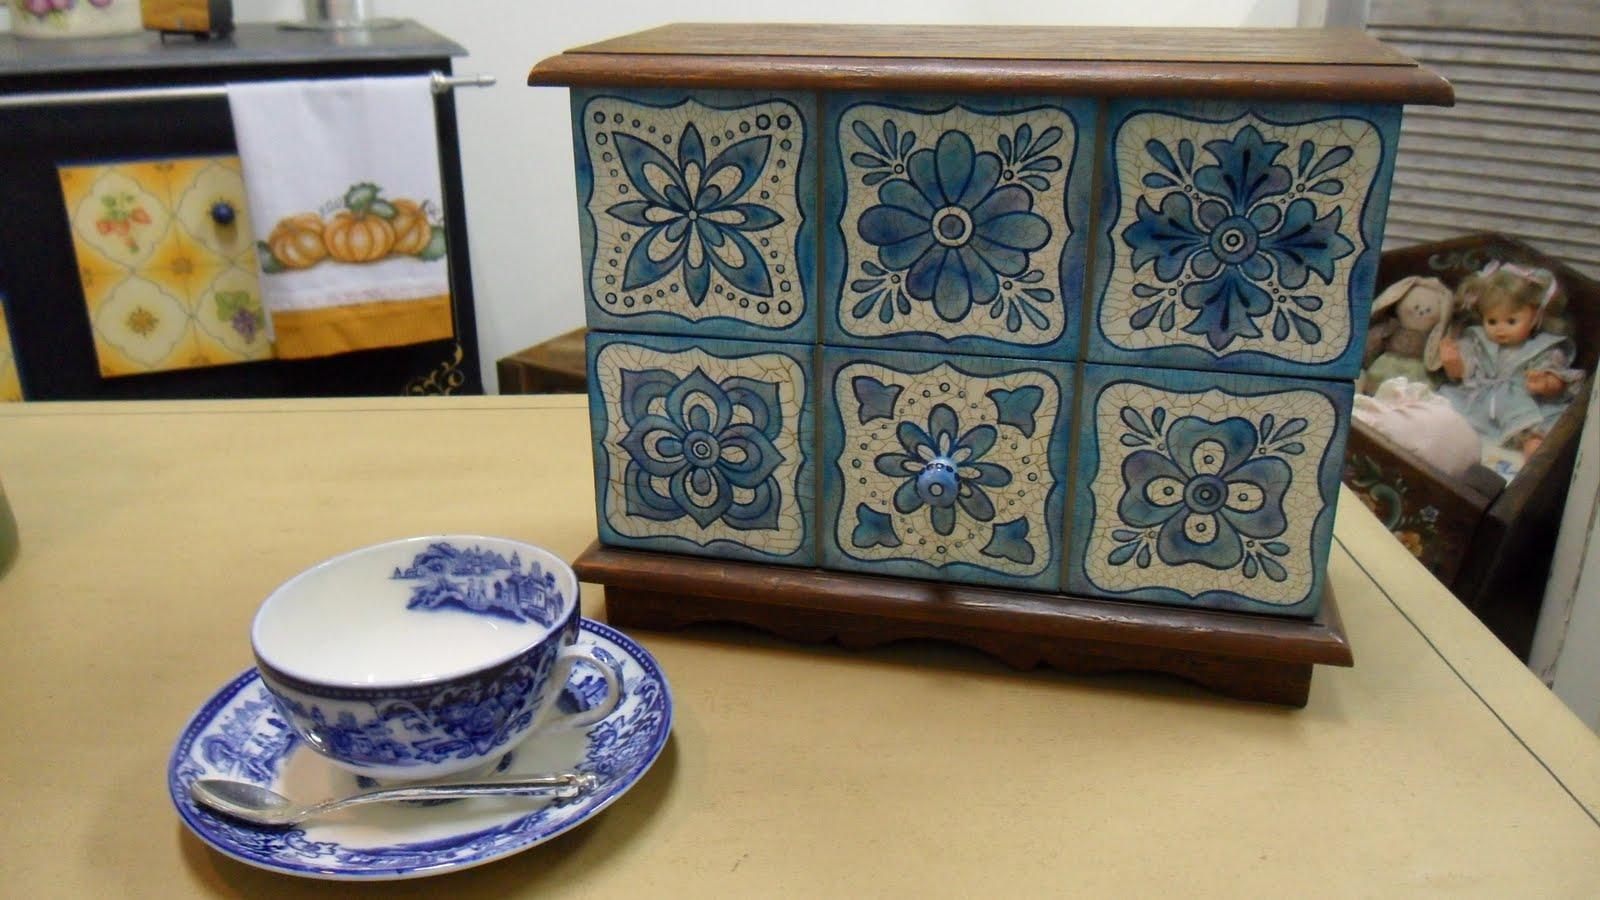 Atelier Malerhaus Pintura Decorativa Azul E Branco